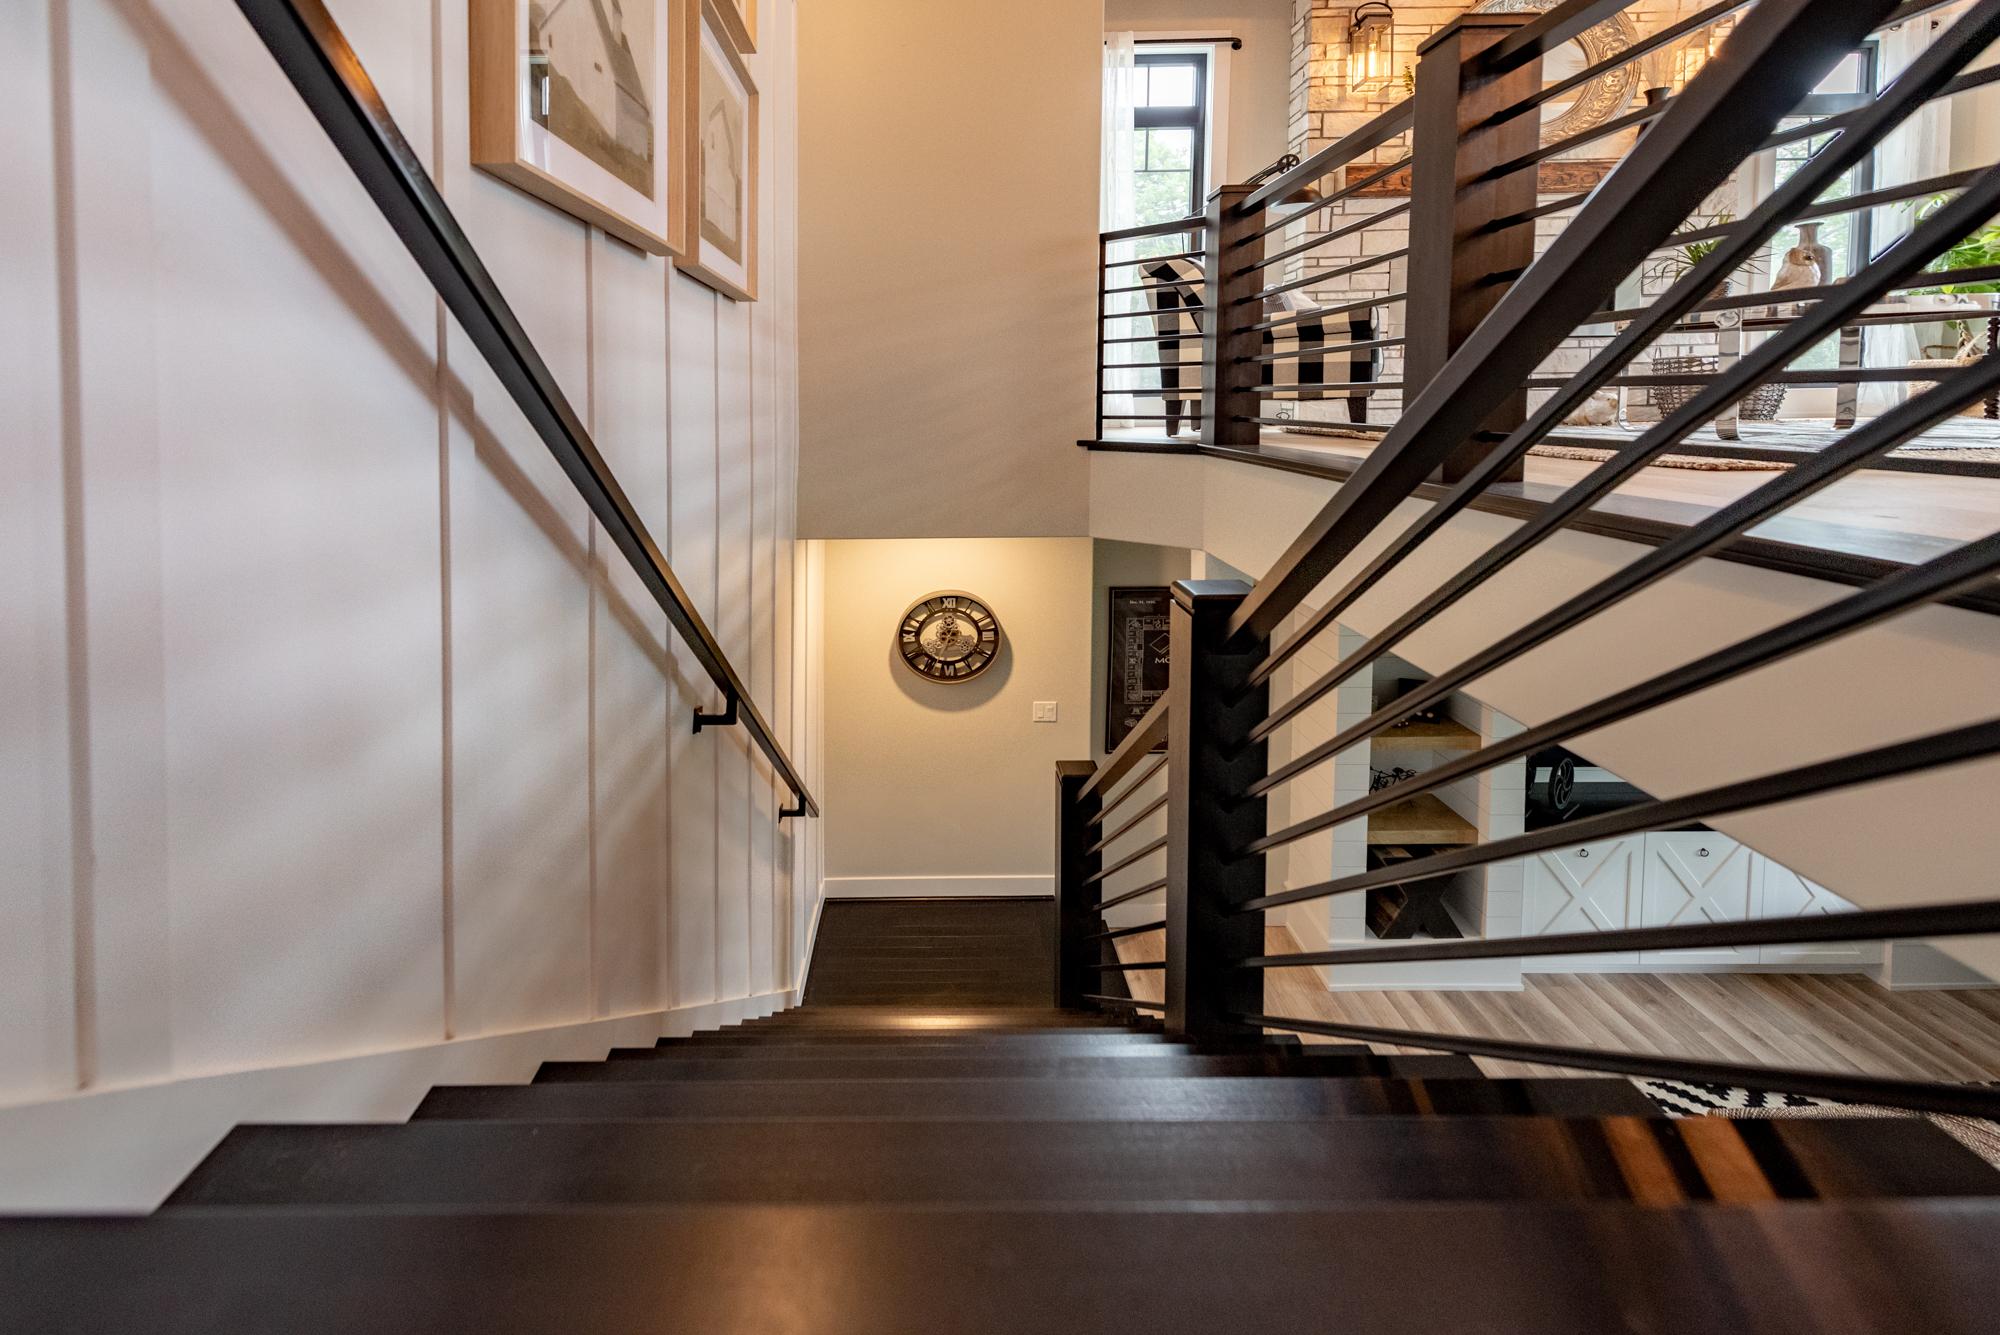 StairwellDAC_7149-HDR_.jpg